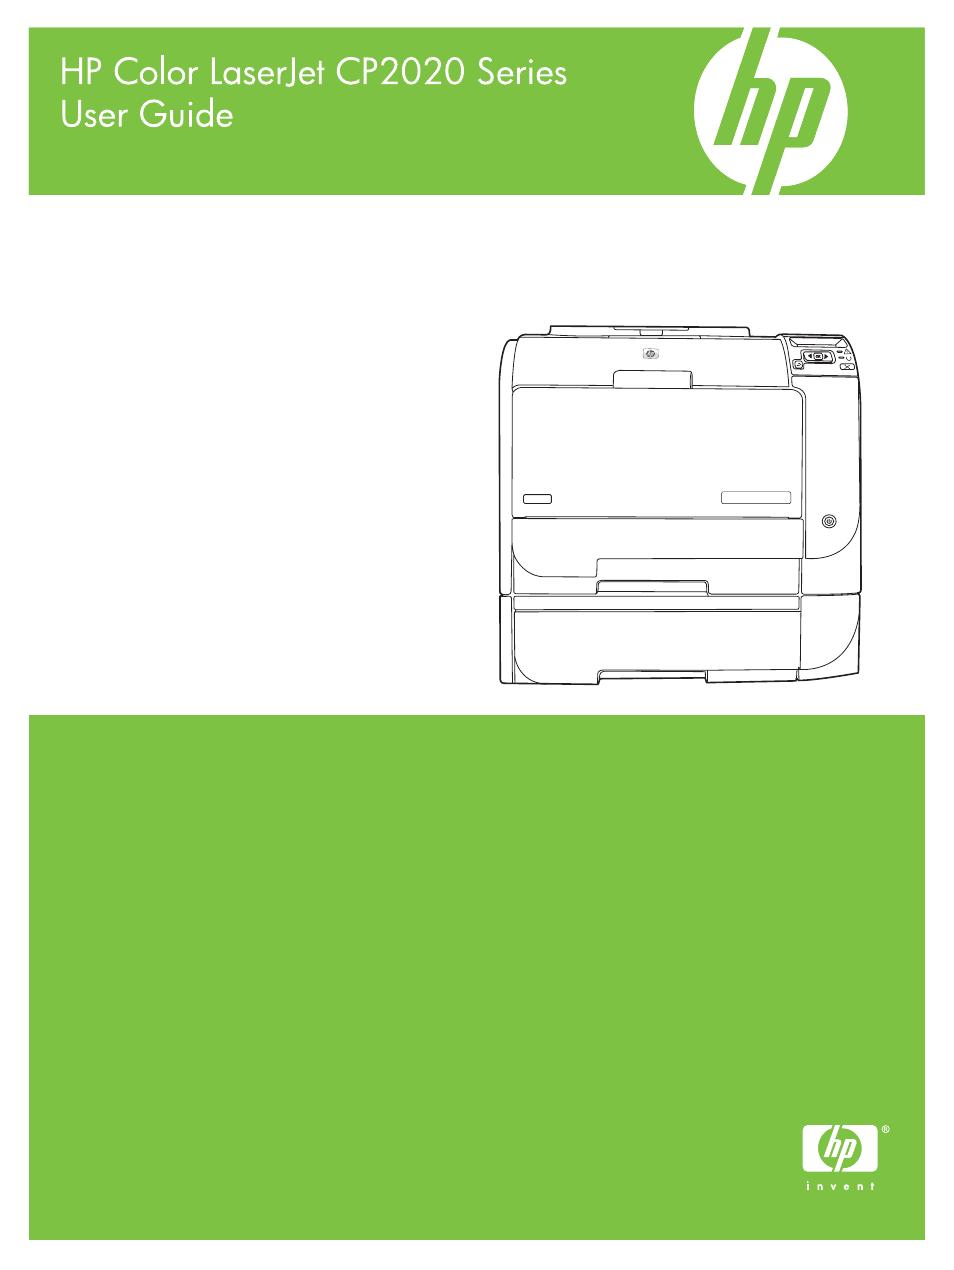 HP Color LaserJet CP2025 Printer series User Manual   166 pages